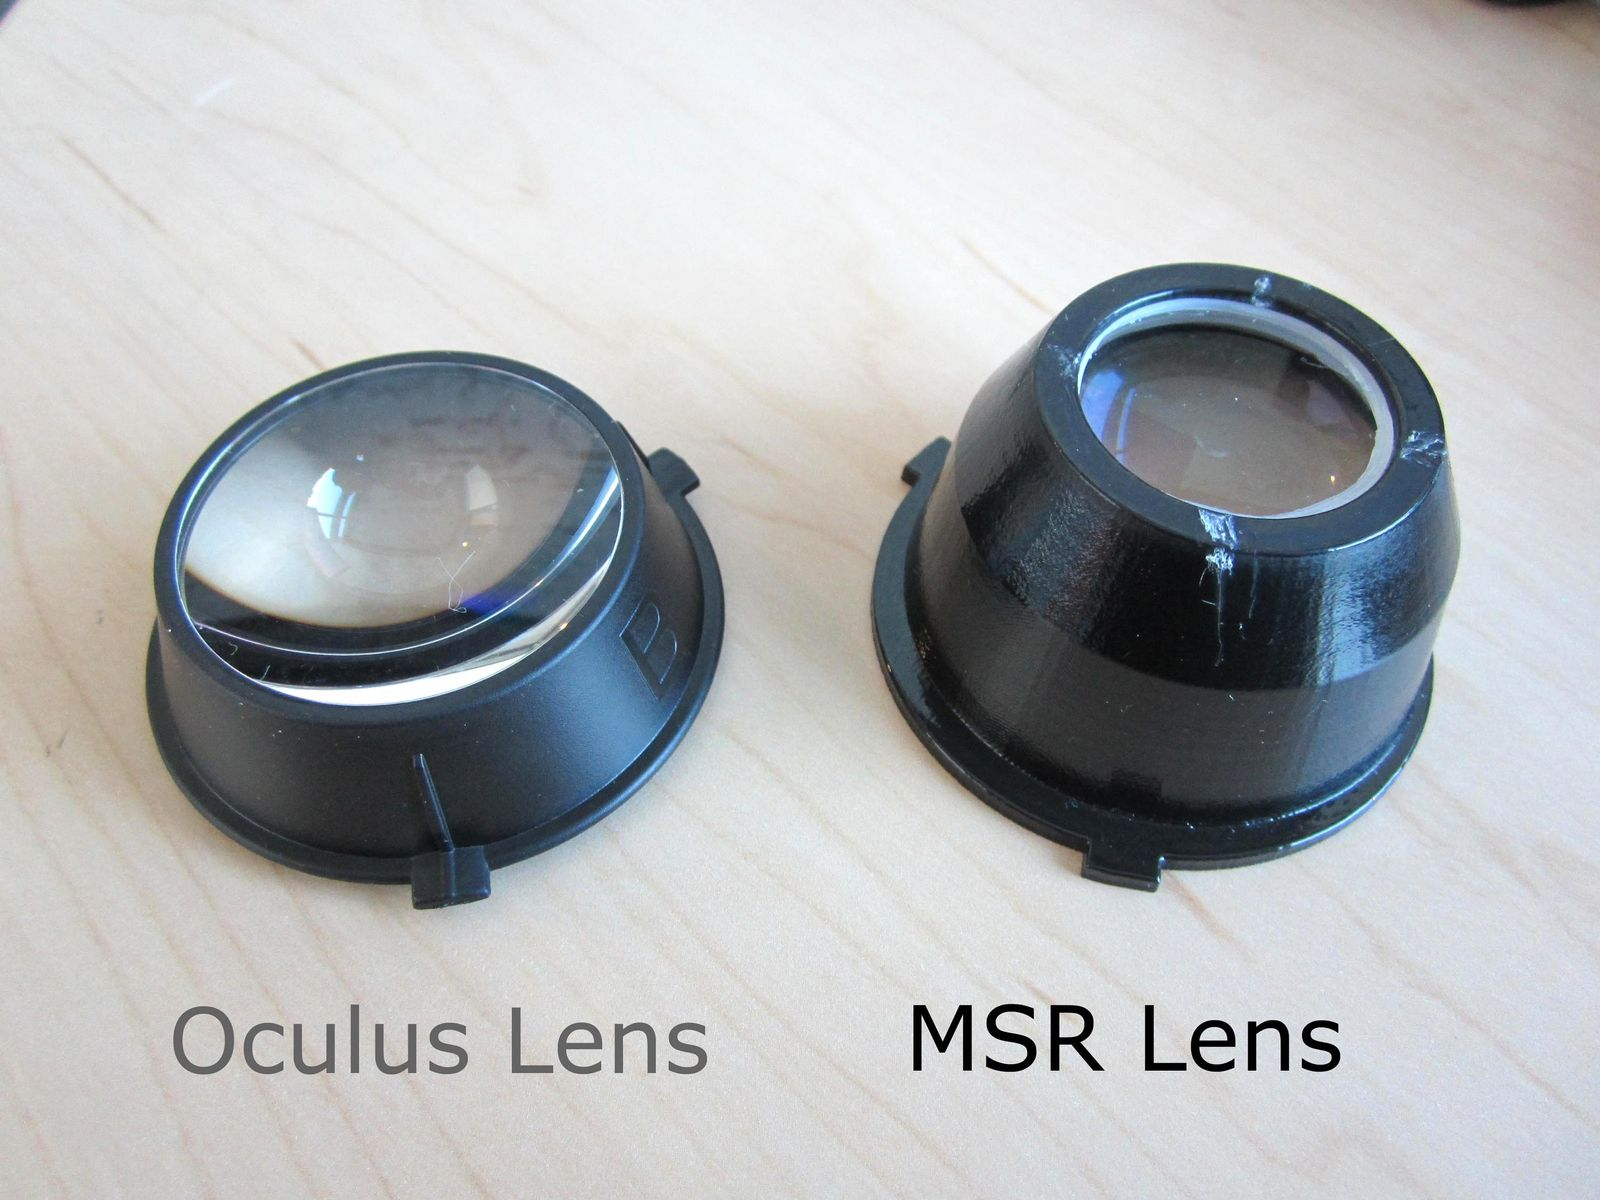 Microsoft-Linse für Oculus Rift